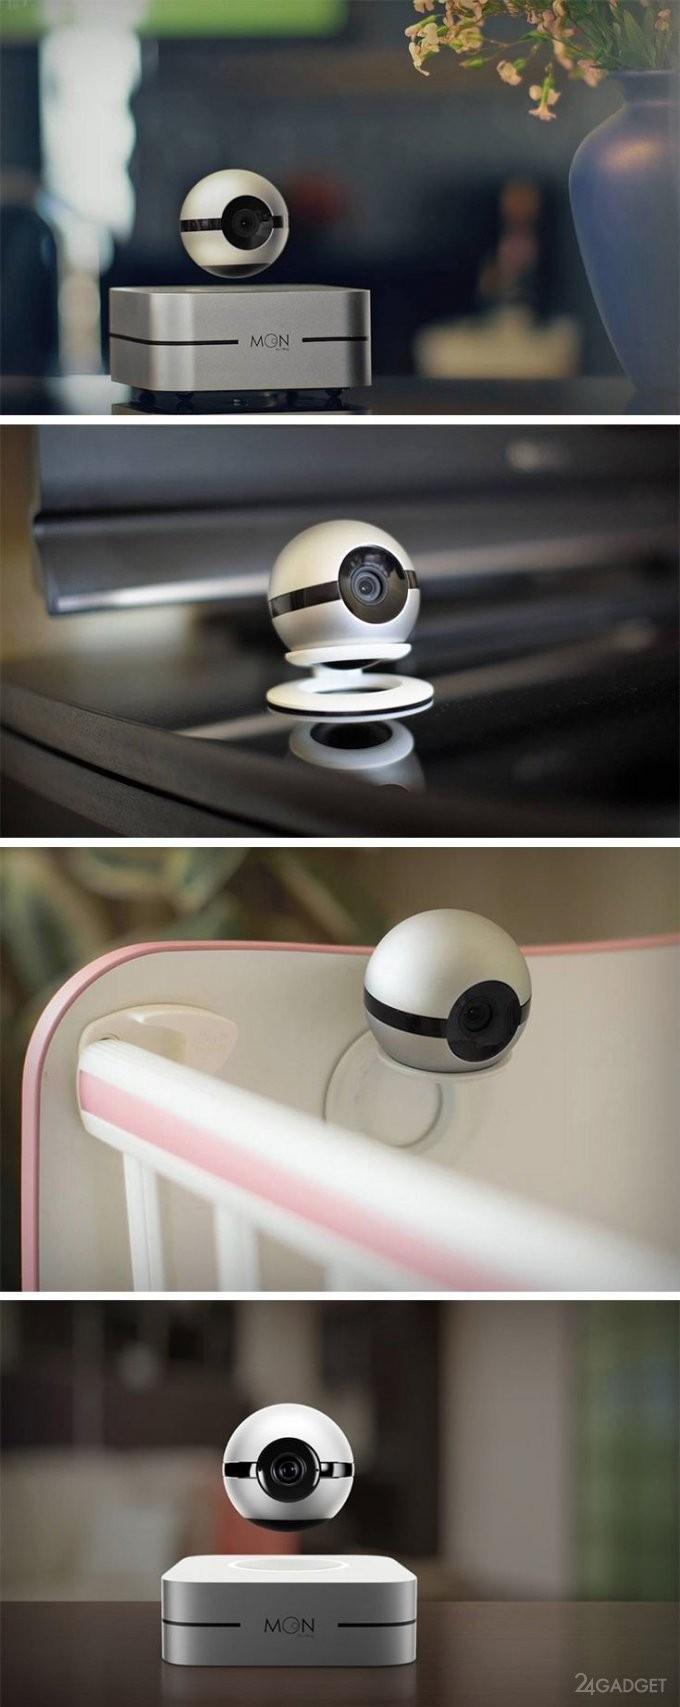 Многоцелевая левитирующая камера безопасности (9 фото + видео)